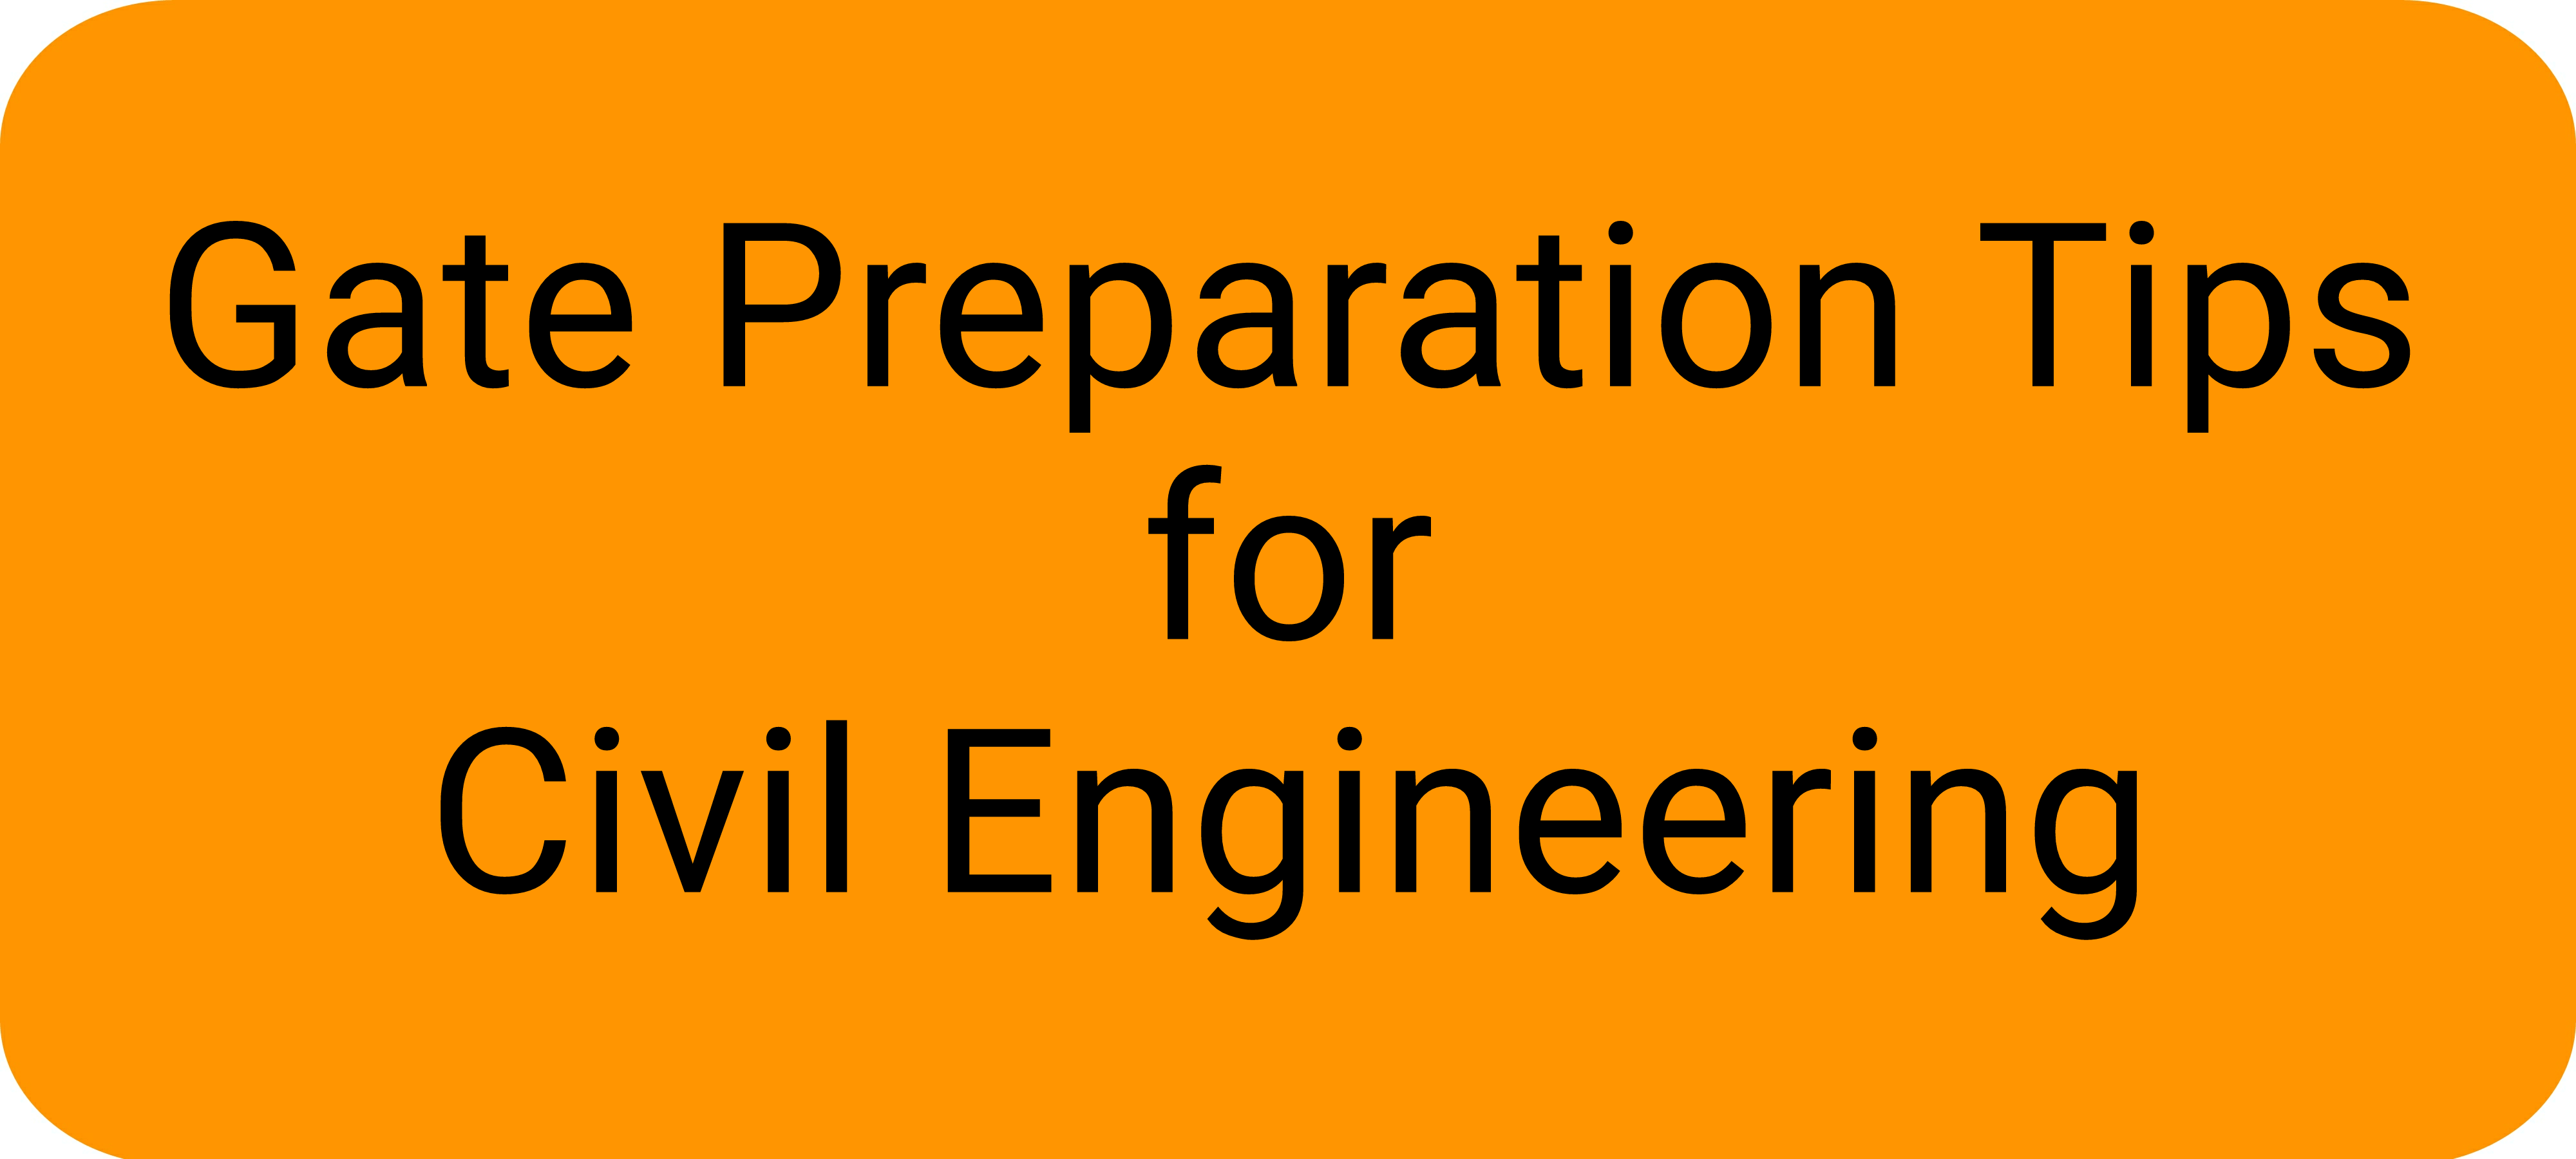 Gate preparation tips for civil